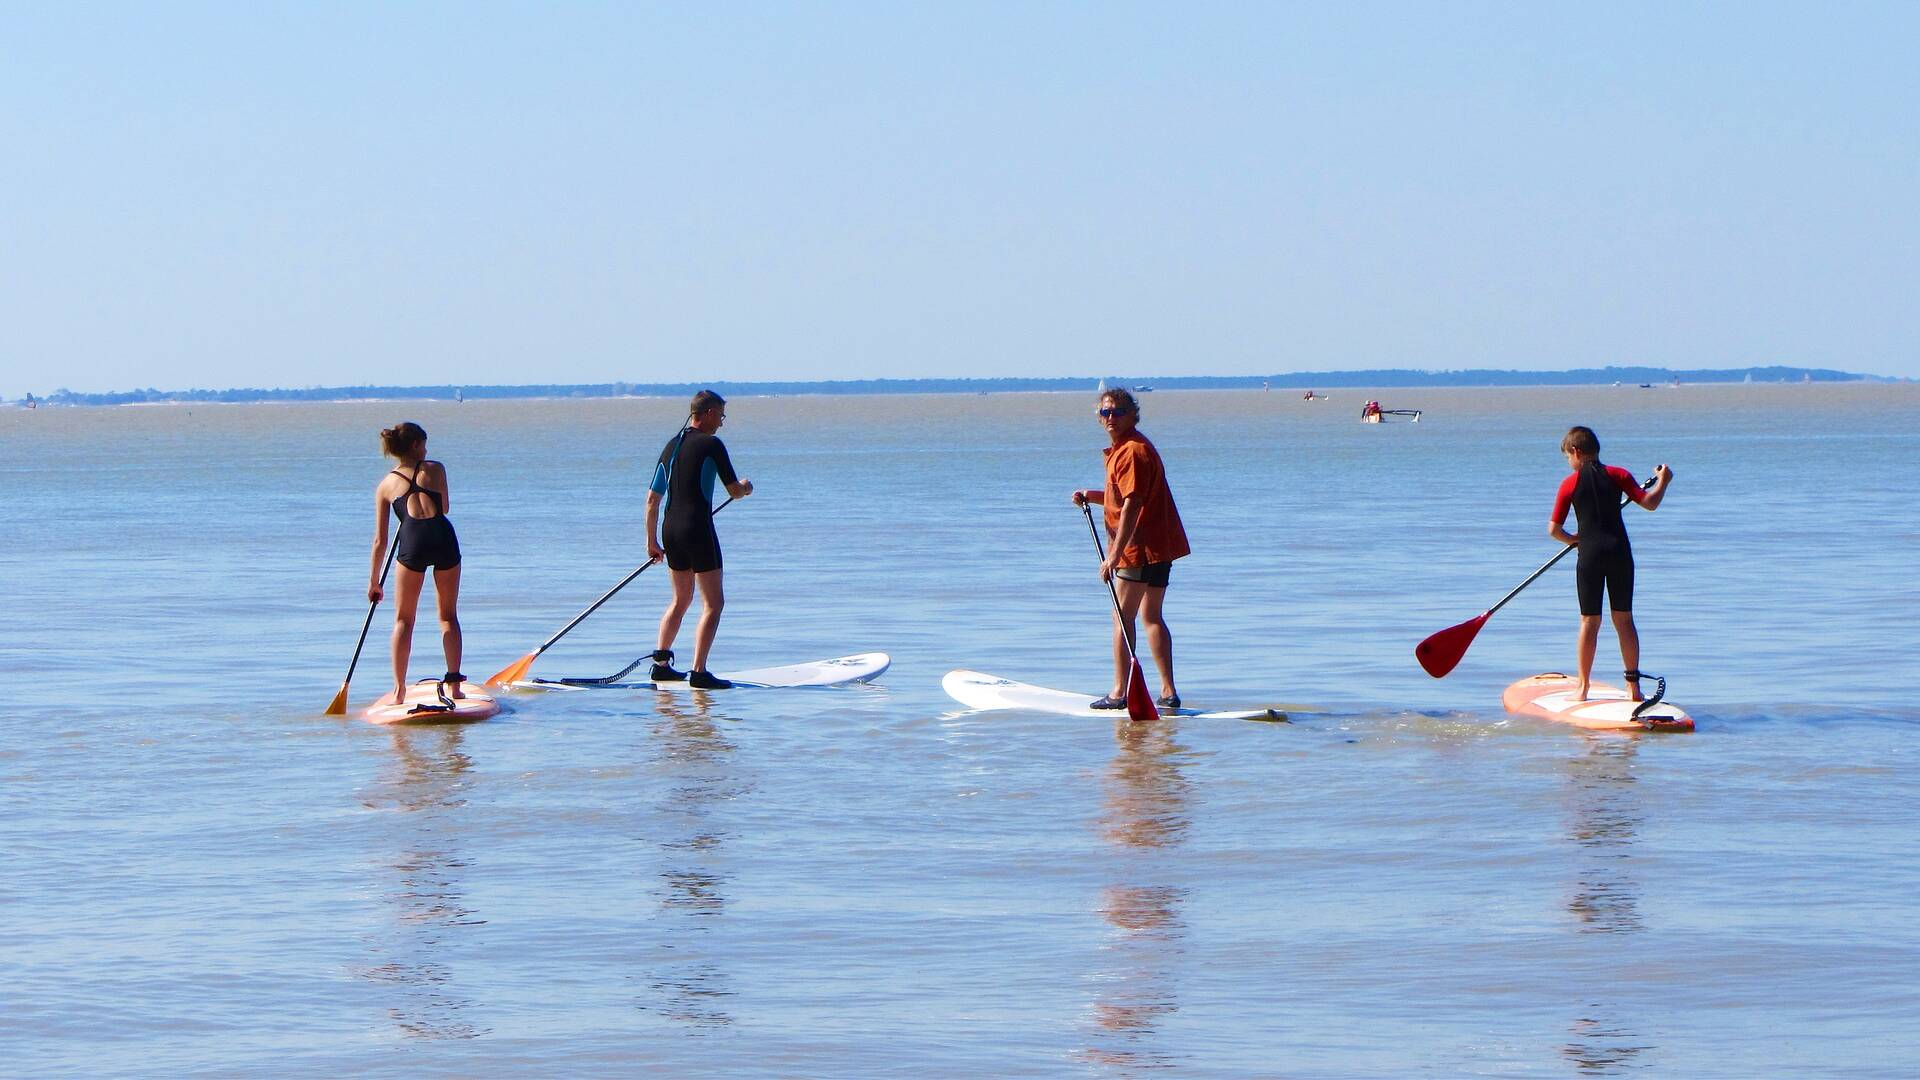 Balade en paddle, Antioche Kayak, station balnéaire de Fouras-les-Bains